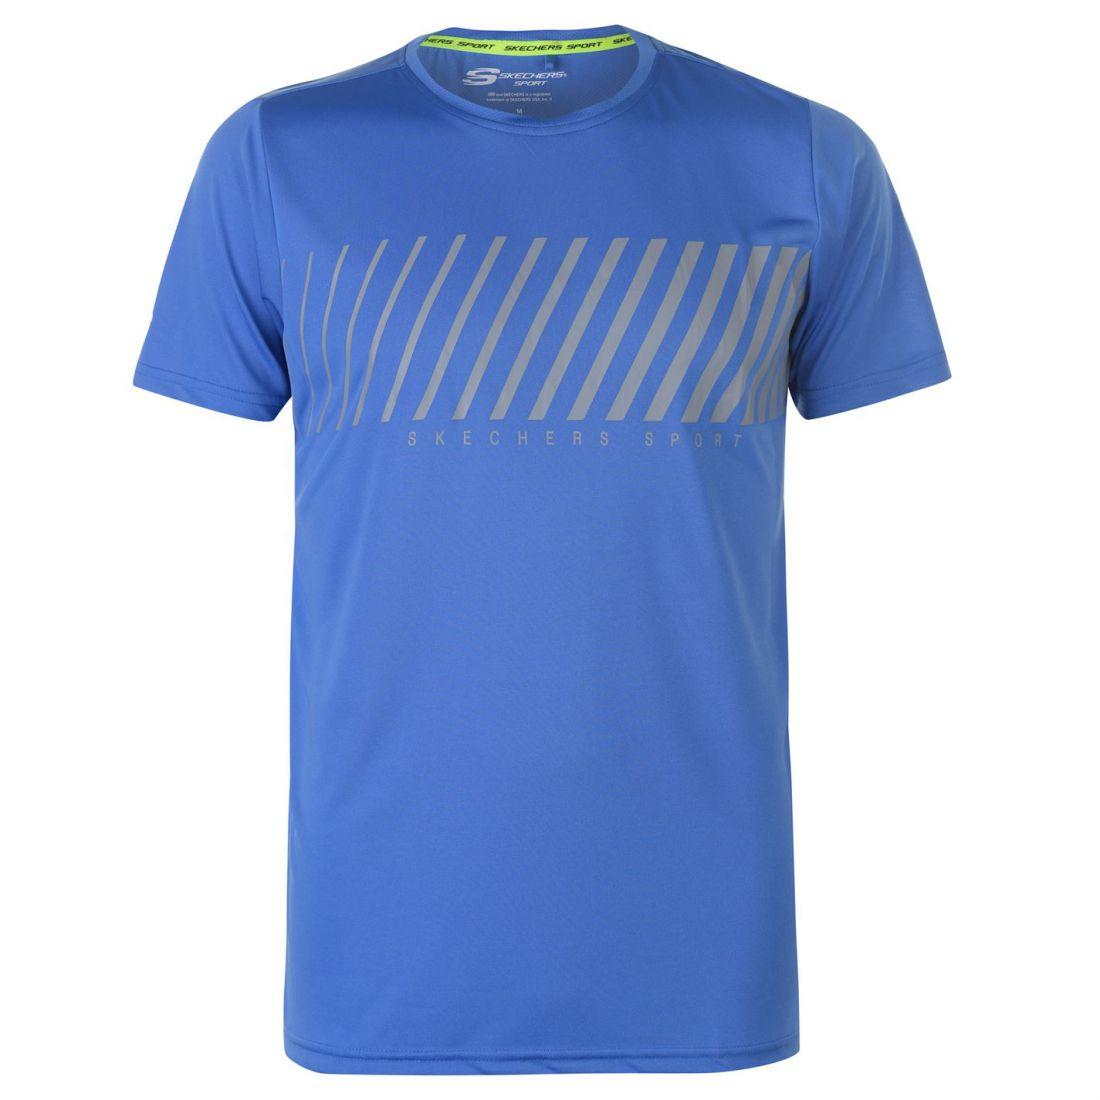 Skechers-Mens-Rendimiento-Grafico-camiseta-Manga-Corta-Camiseta-Top-Cuello-Redondo miniatura 11